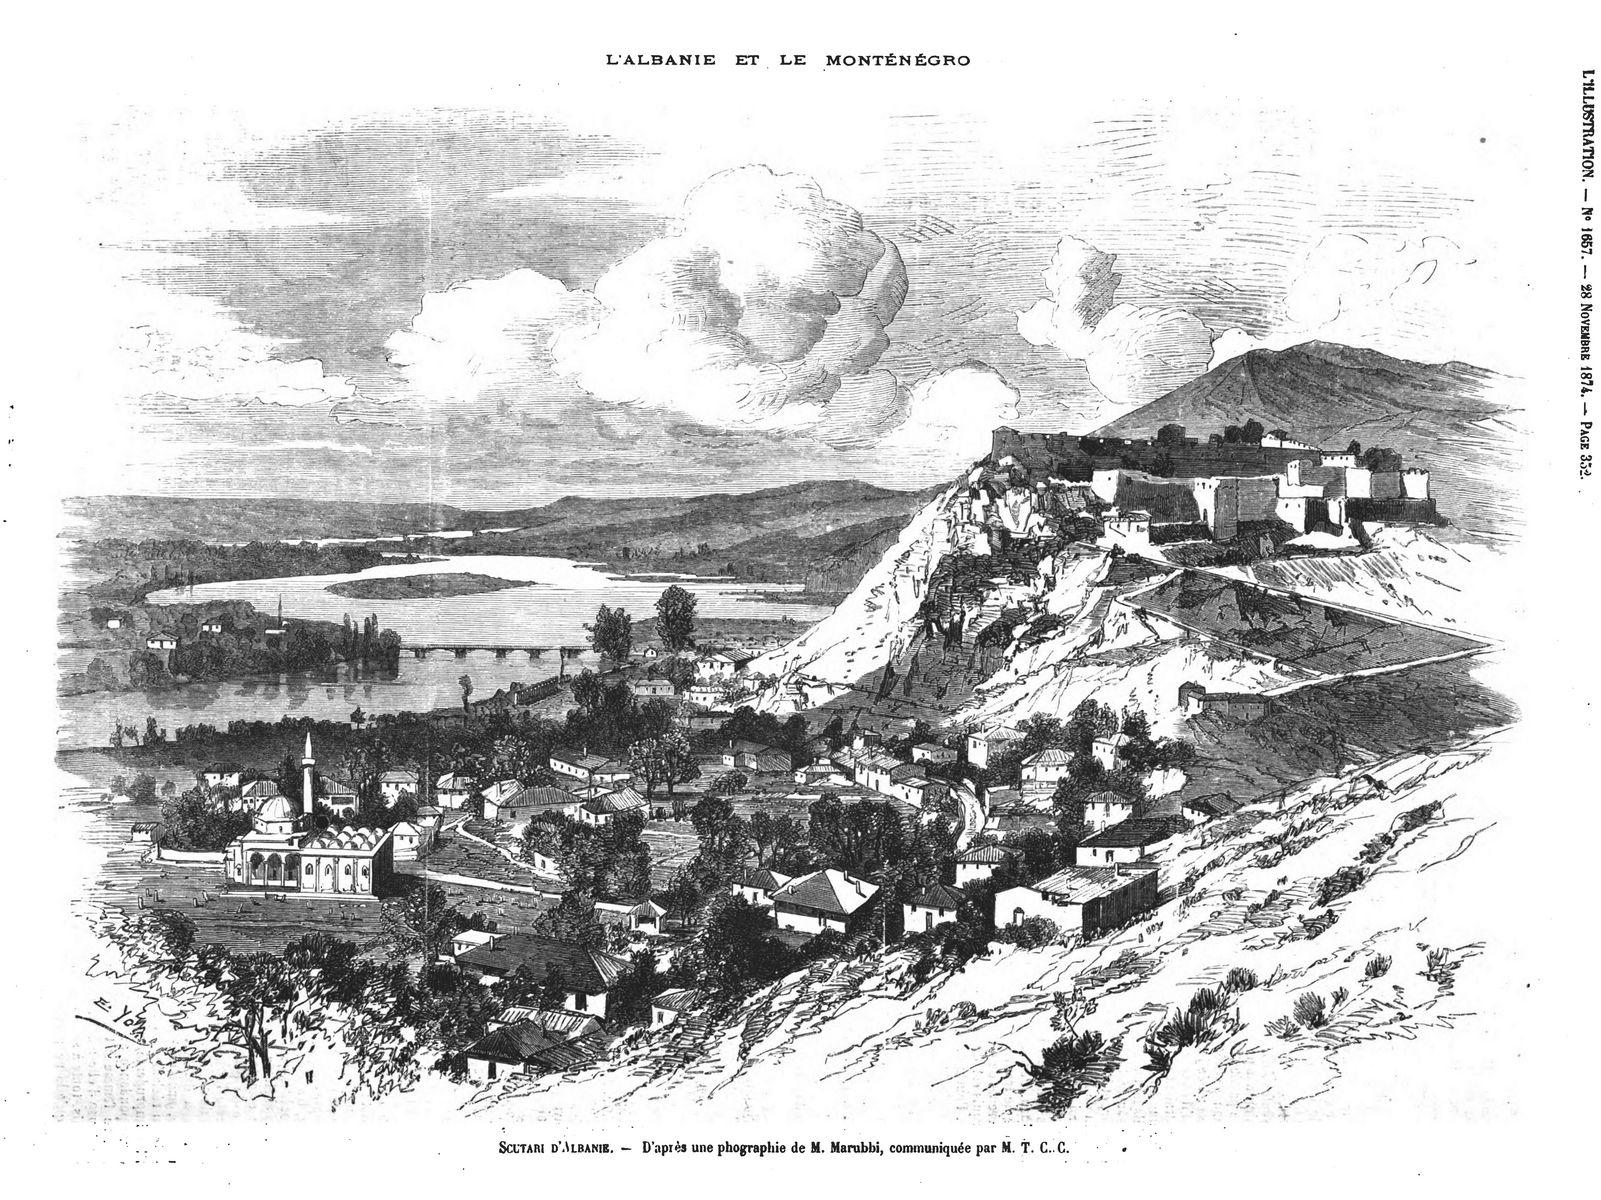 L'Albanie et le Monténégro . Sculari d'Albanie